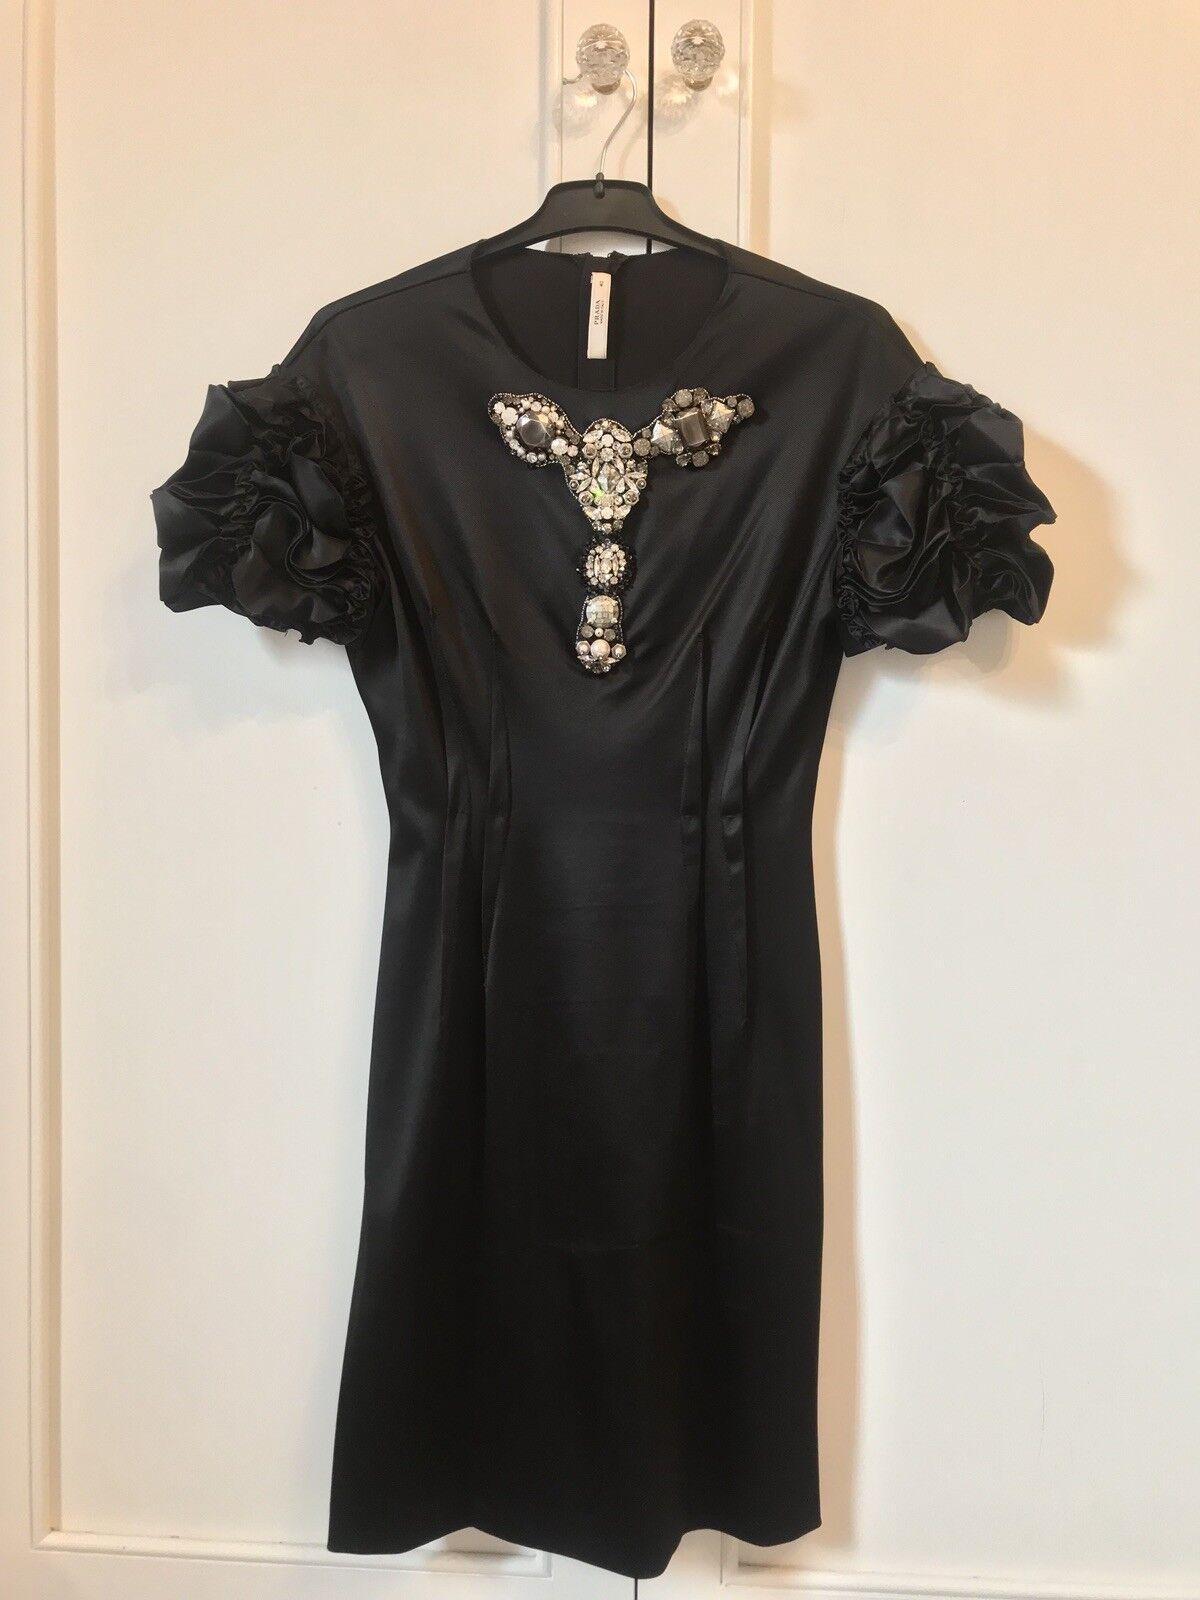 Women's Prada Dress - 8 10